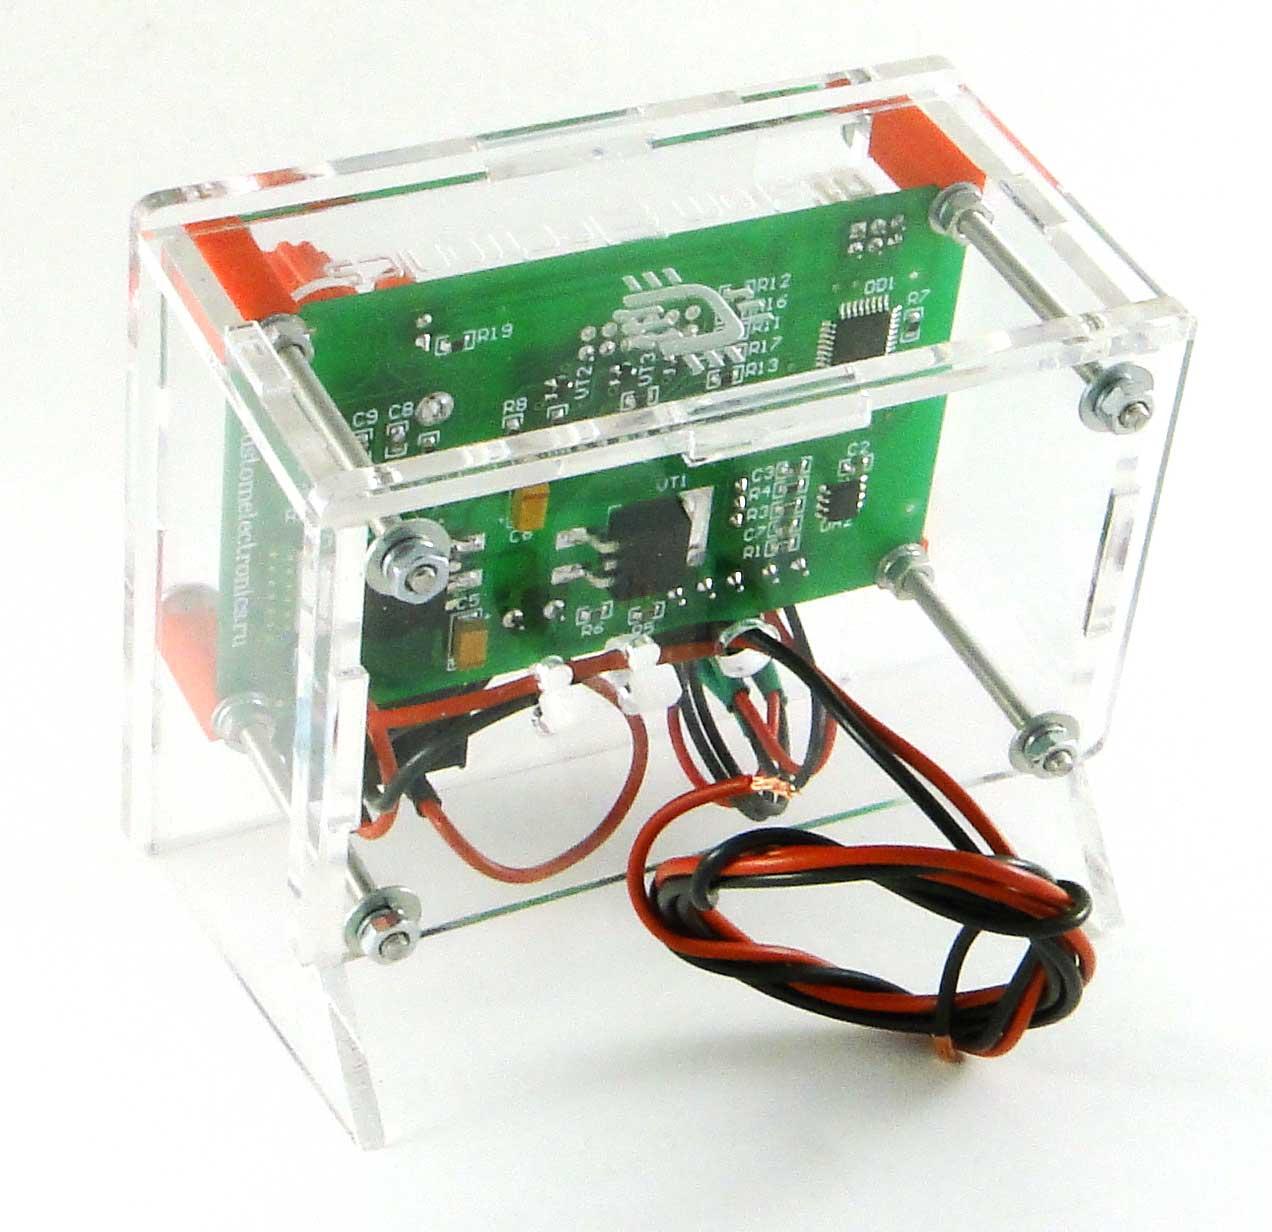 Simple Solder MK936 SMD. Паяльная станция на SMD-компонентах своими руками - 13